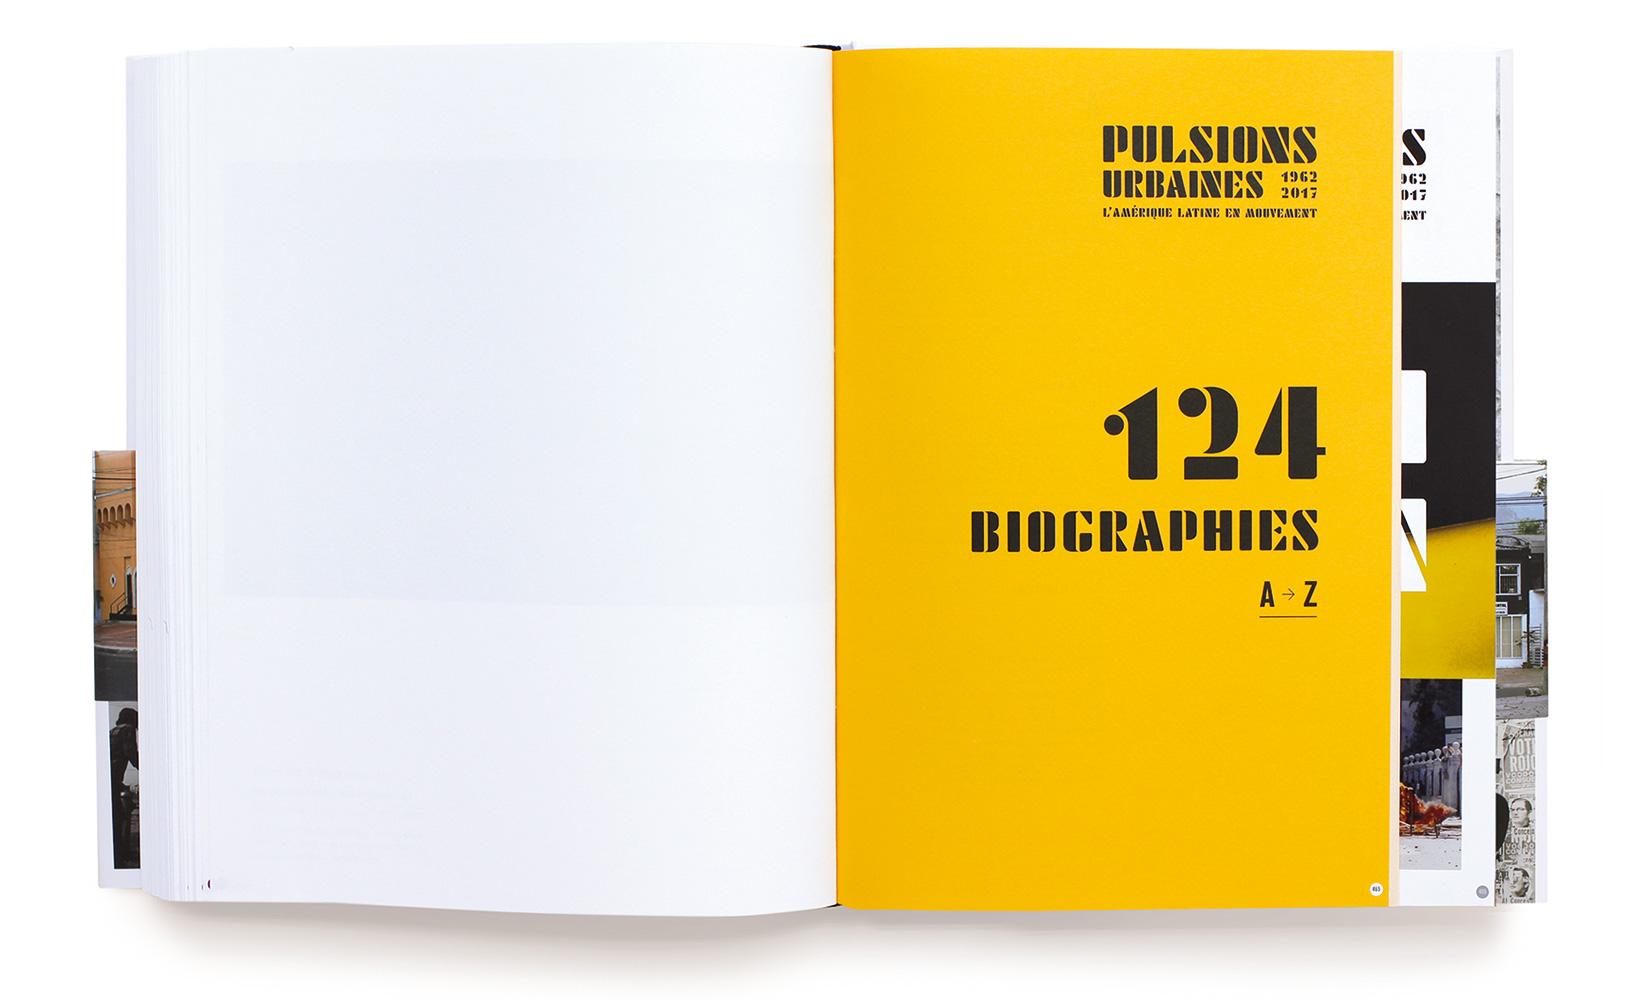 olivier-andreotti-pulsions-urbaines-14.jpg